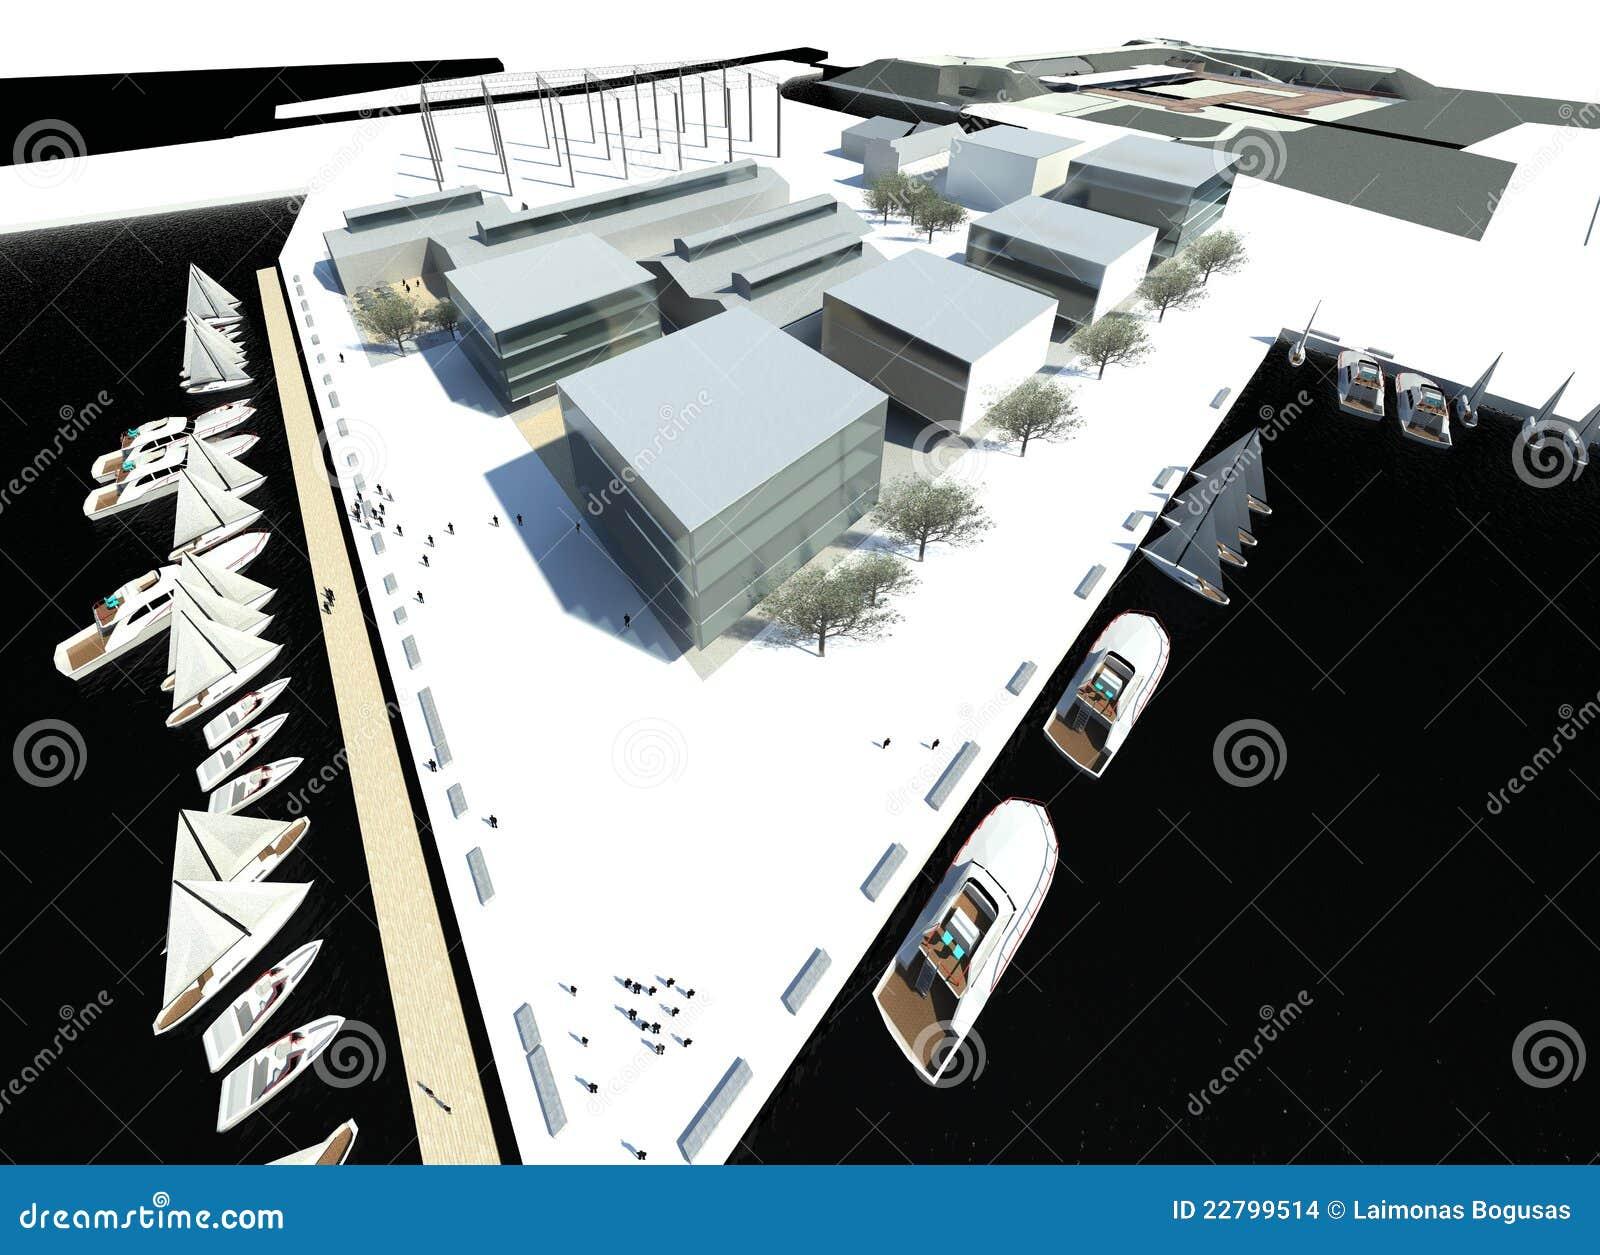 Rappresentazione costruzioni moderne argine immagini for Costruzioni case moderne